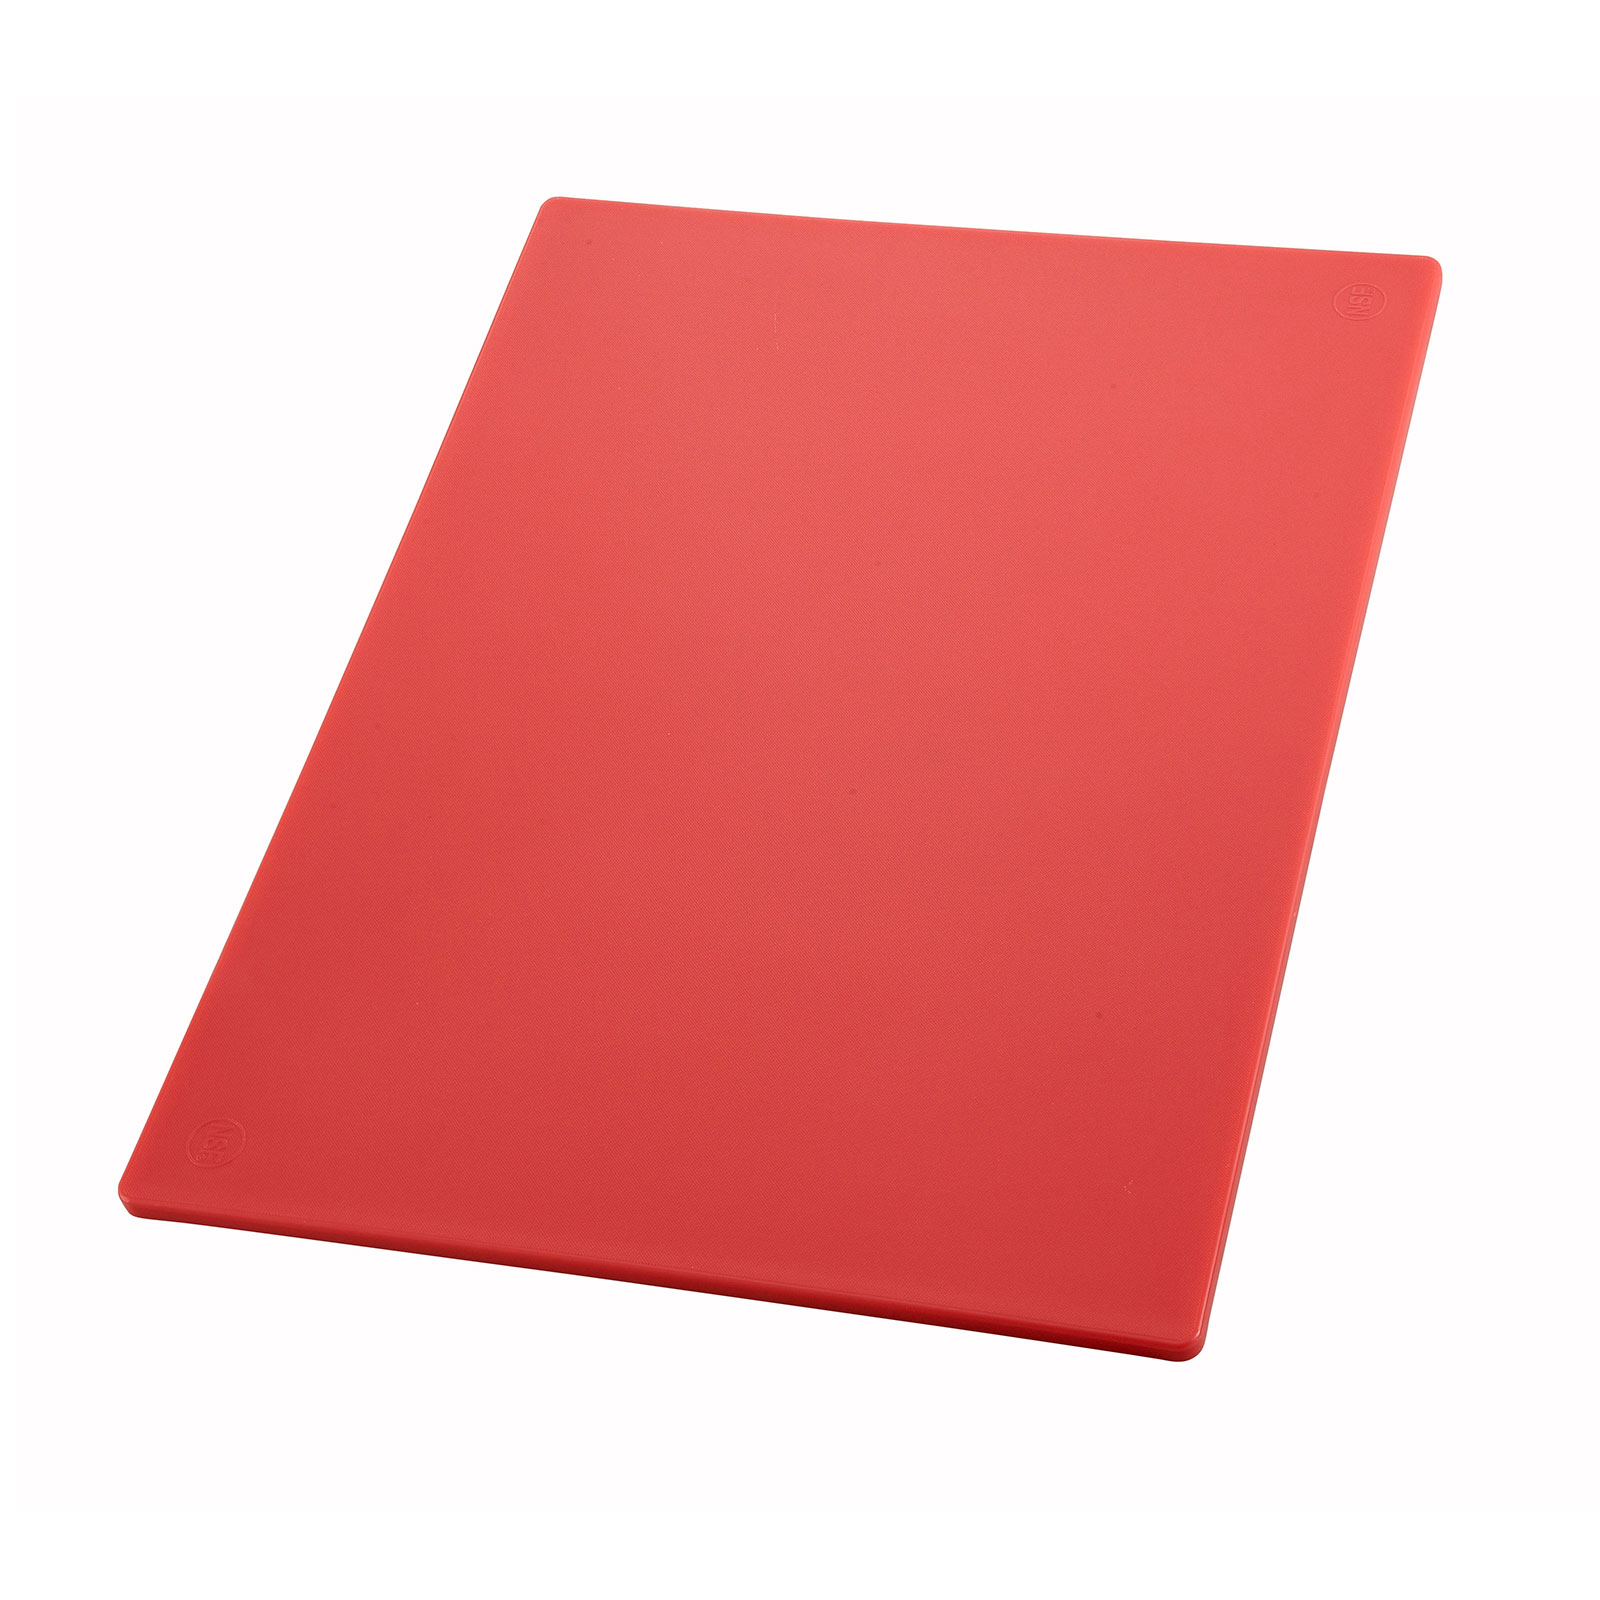 Winco CBRD-1520 cutting board, plastic